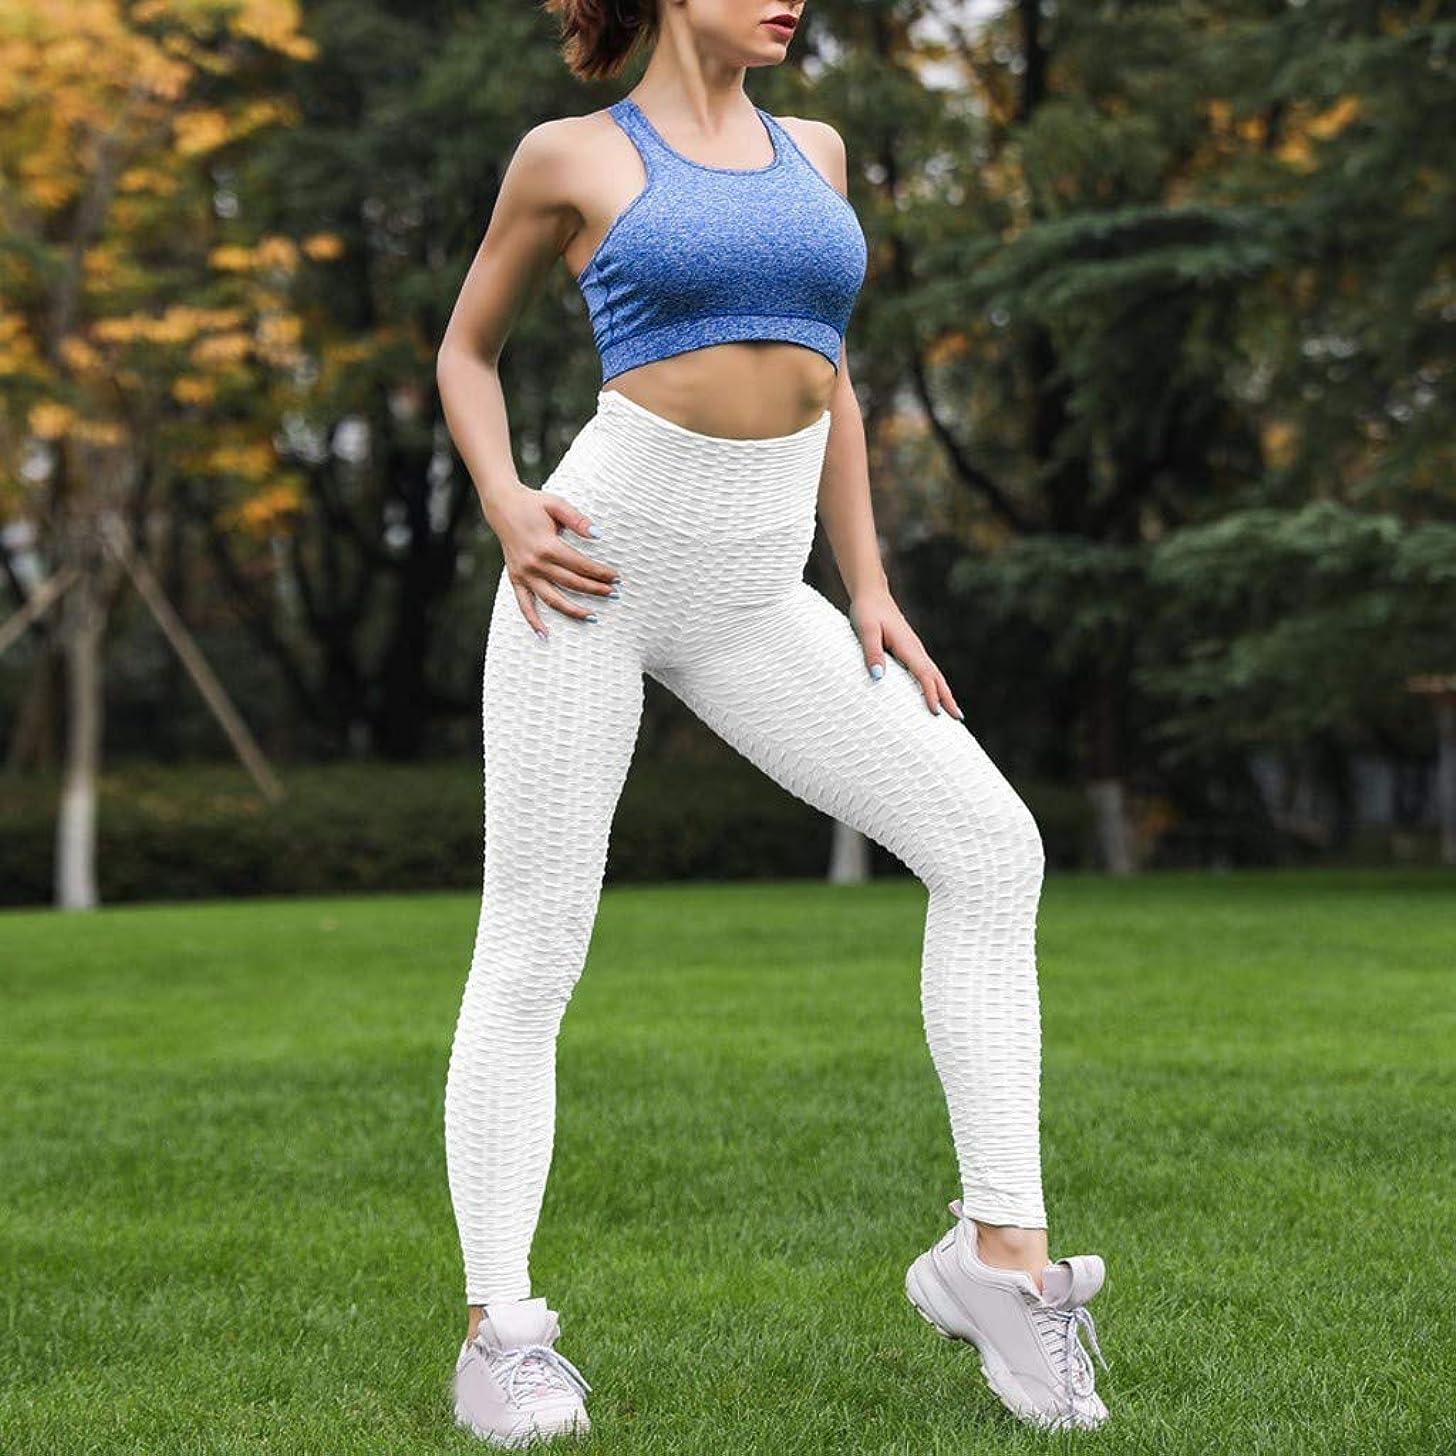 CapsA Yoga Pants High-Waist Tummy Control Fold Cross Strap Leggings Running Sports Pants Trouser